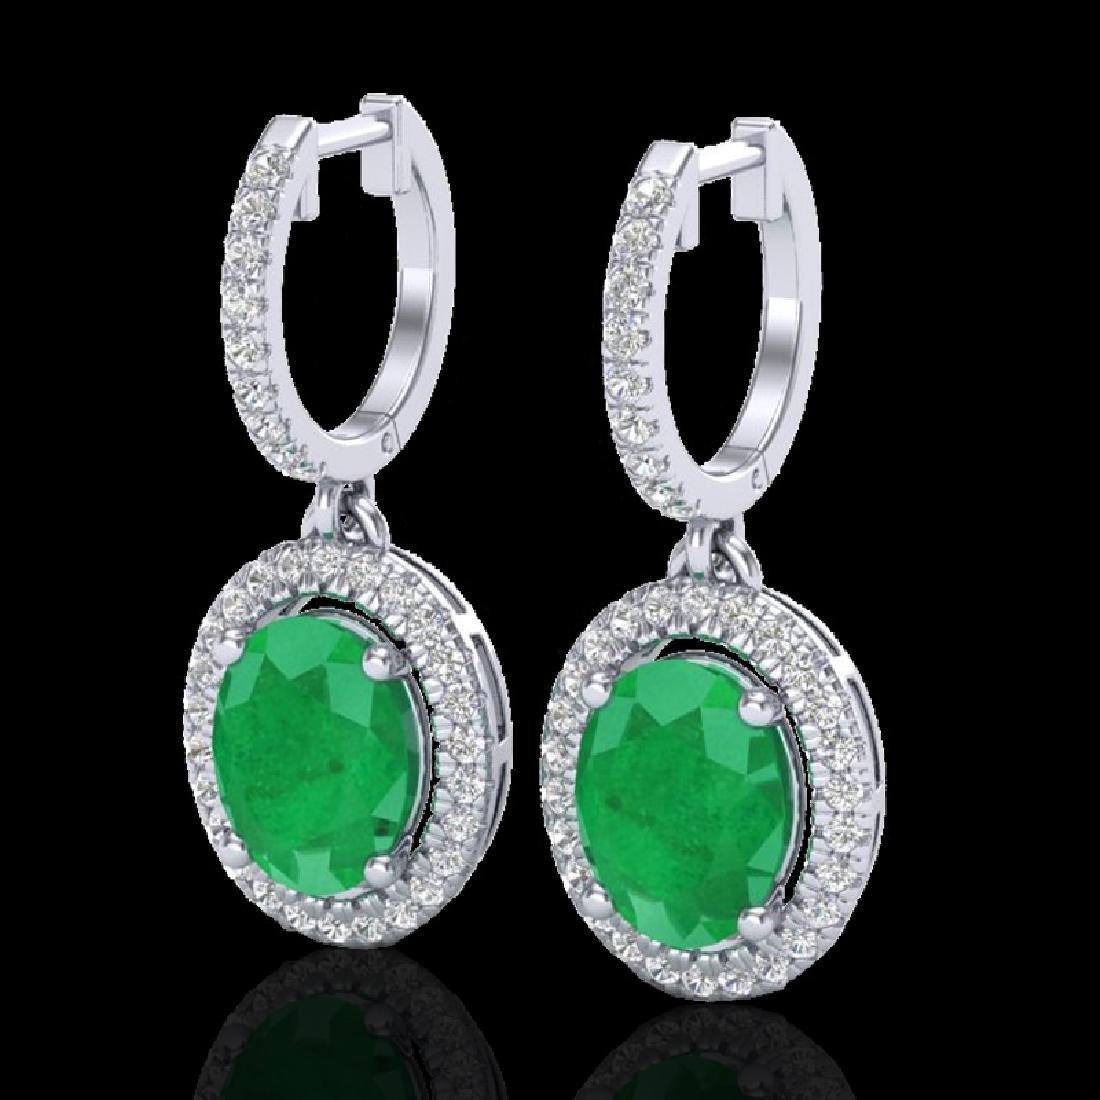 4.25 CTW Emerald & Micro Pave VS/SI Diamond Earrings